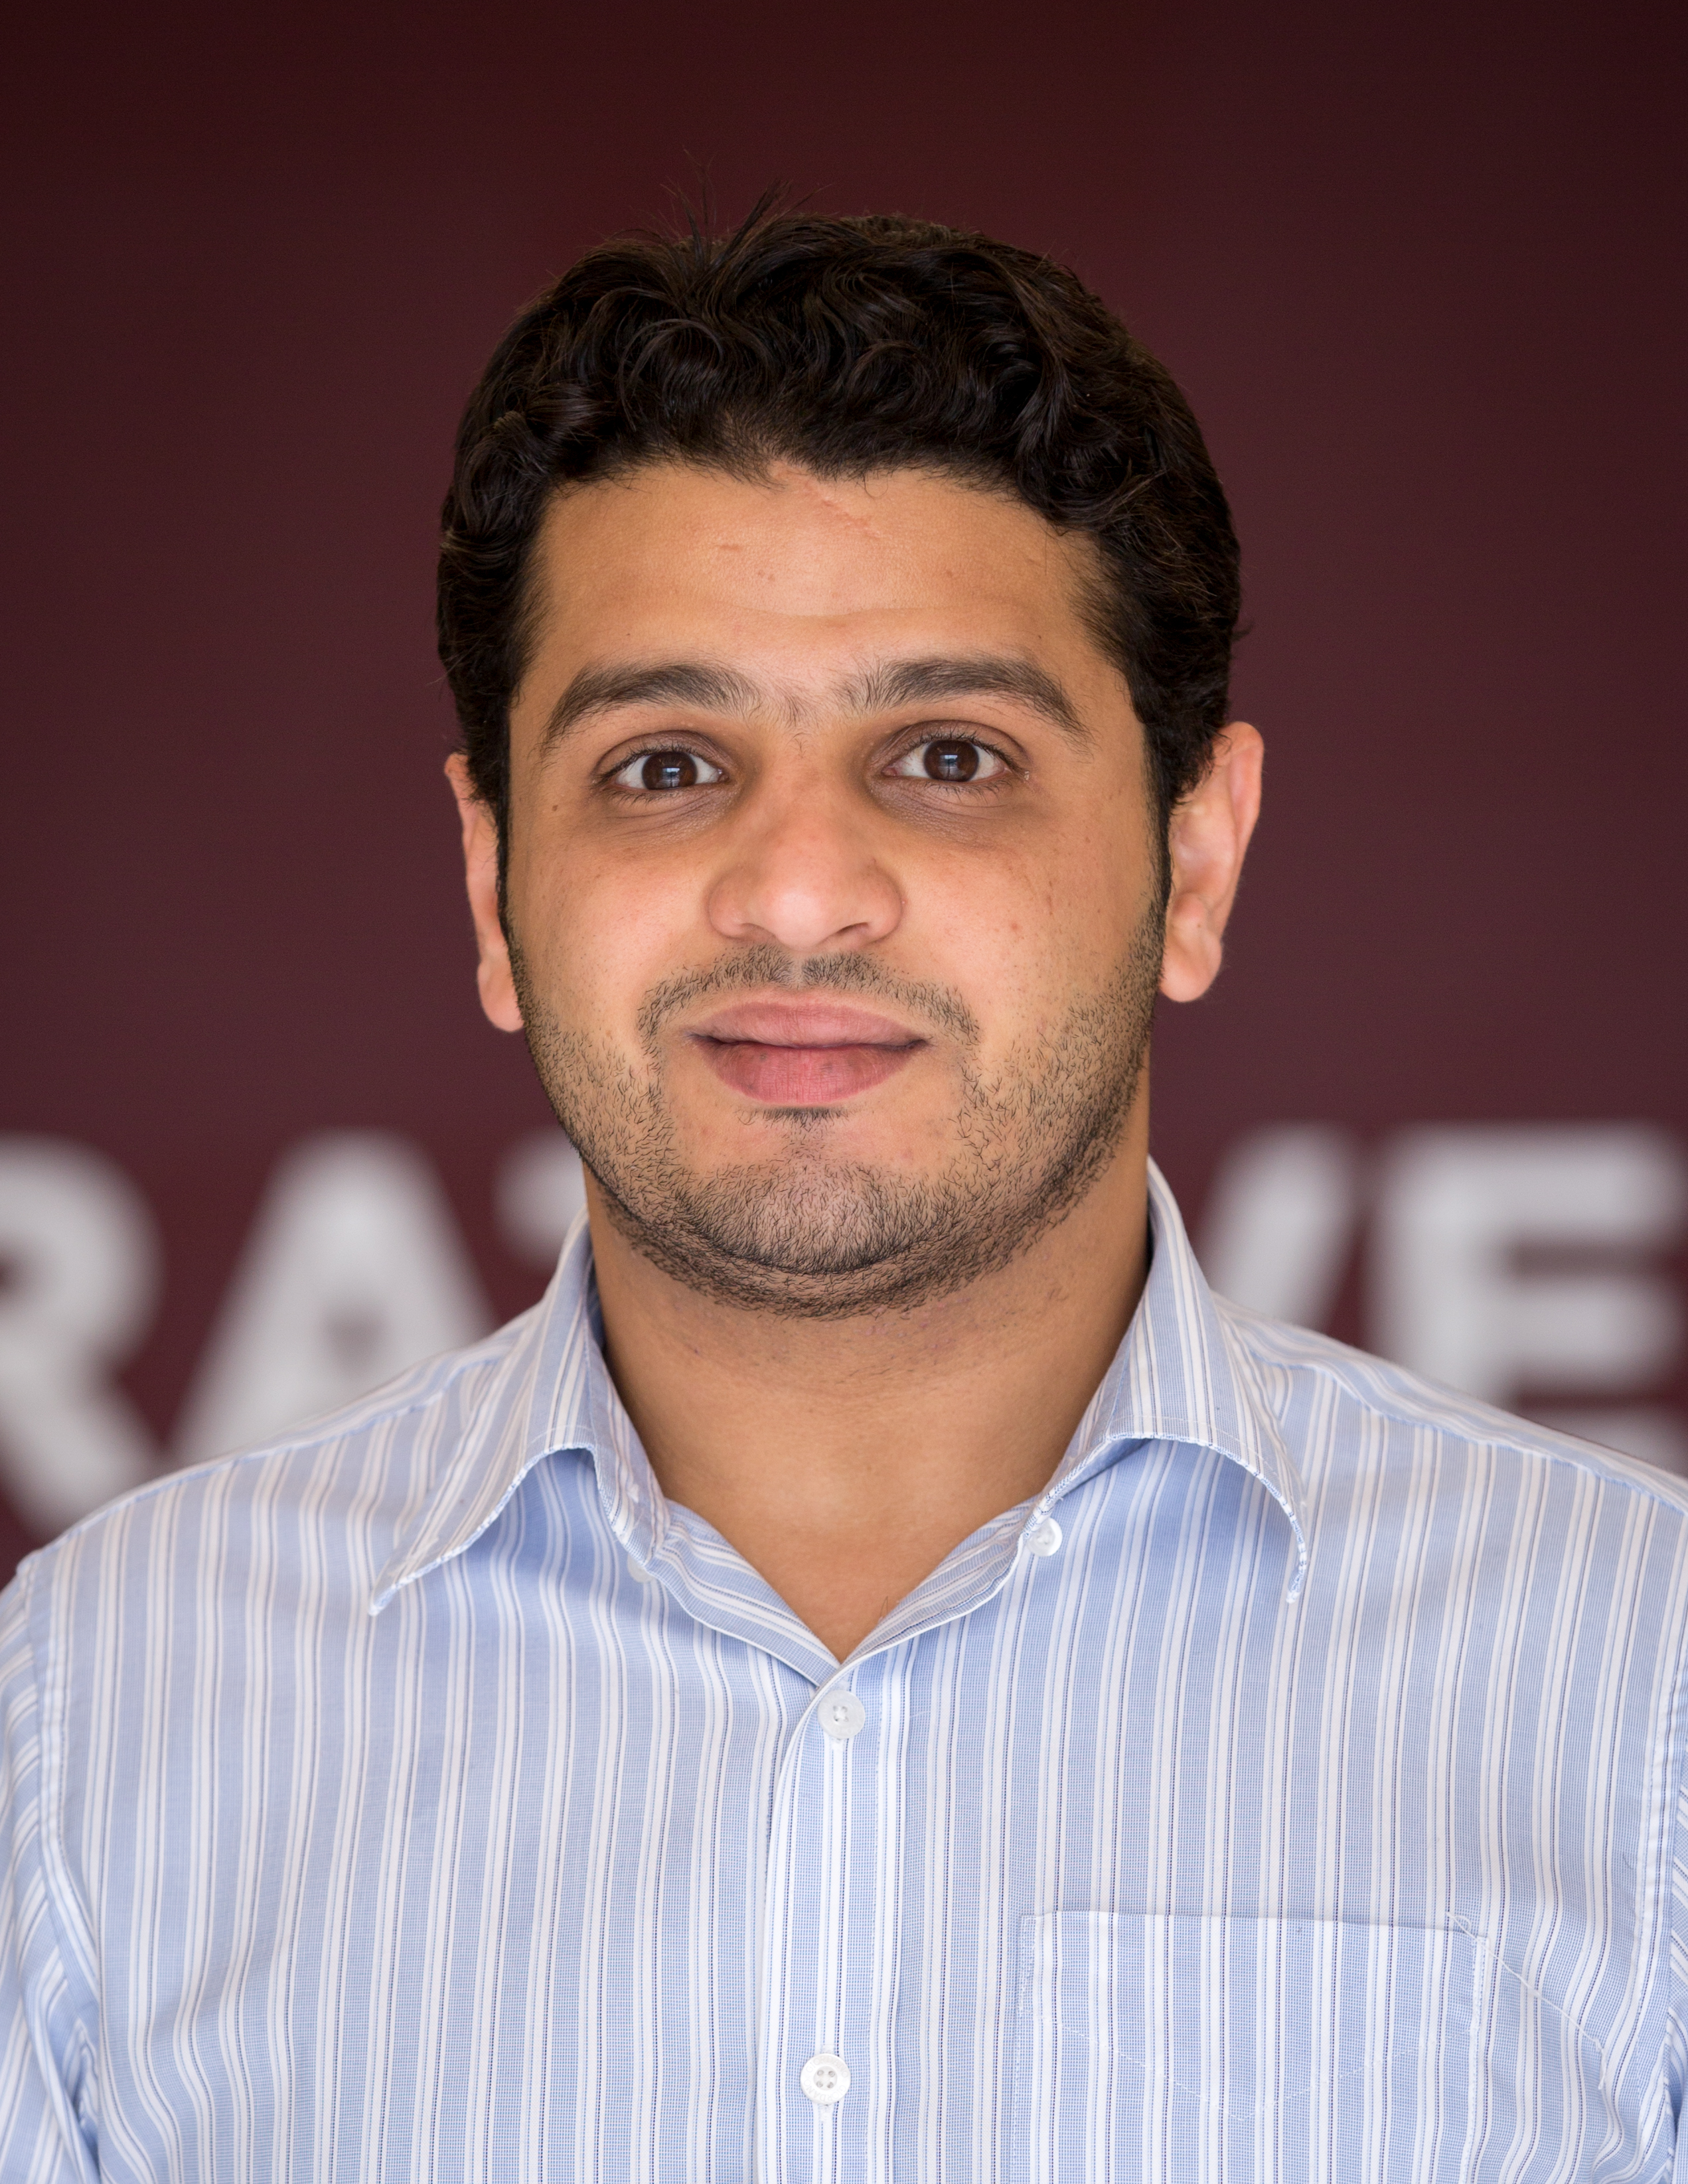 Dr. Mohammed Al-Qahtani